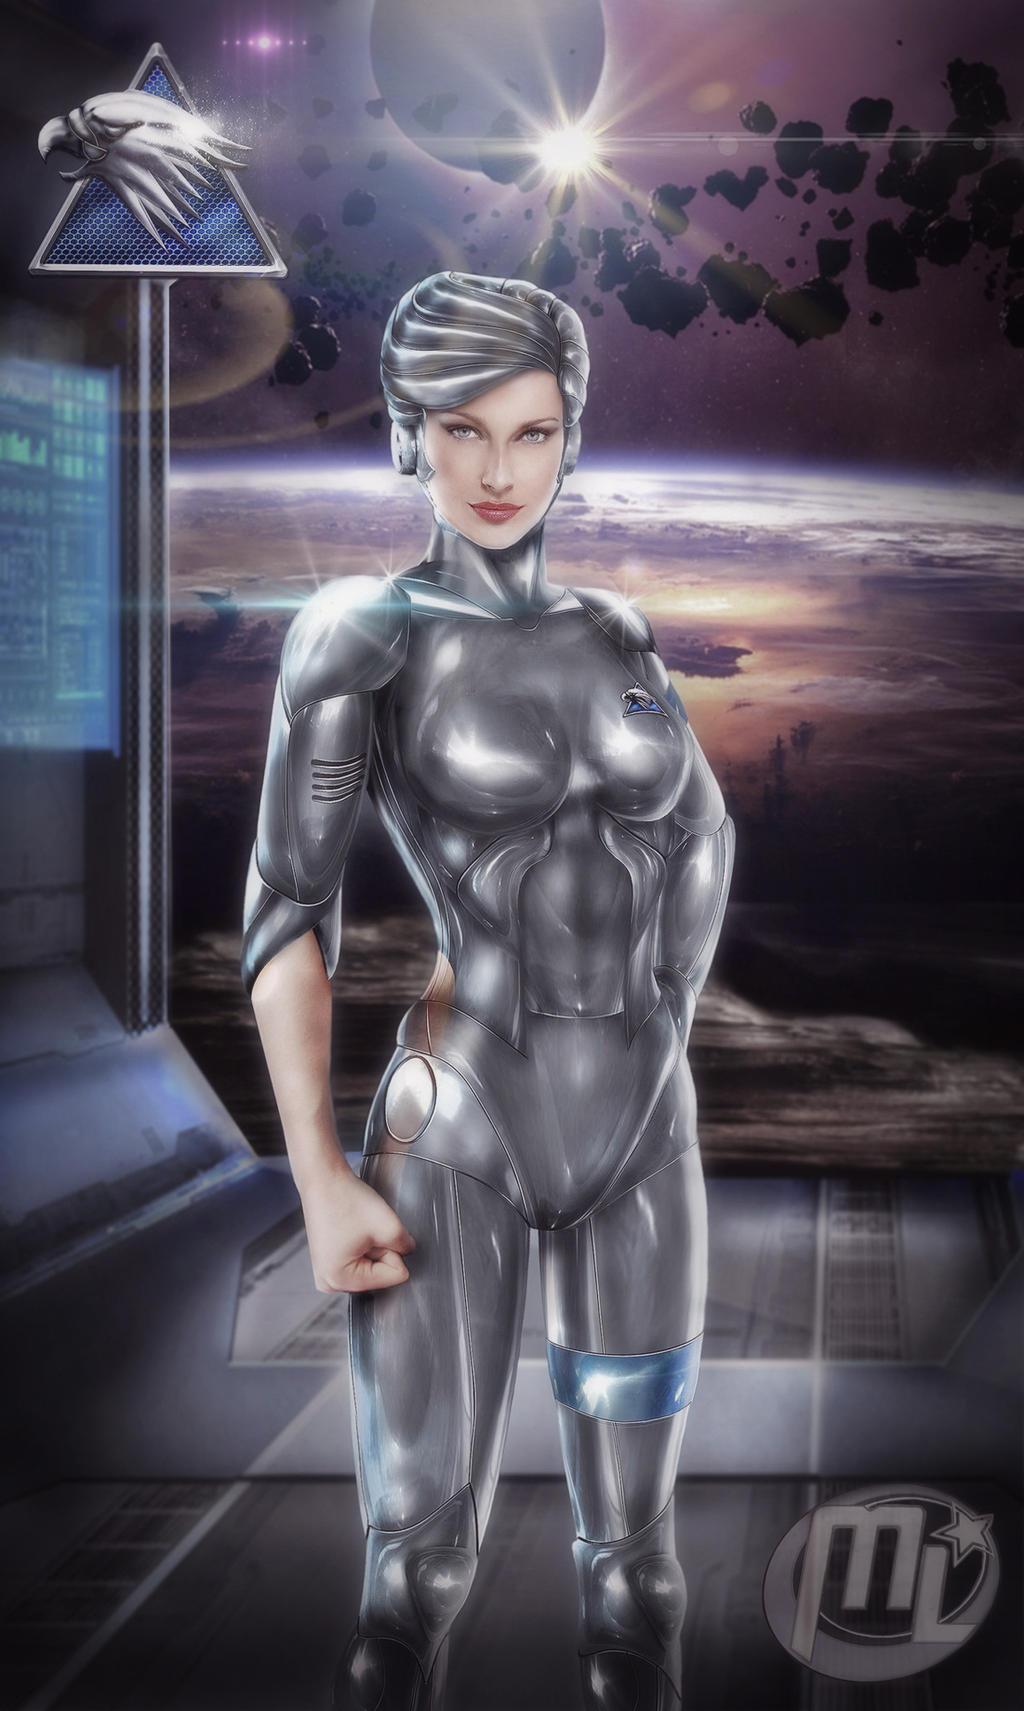 steelheart_from_silverhawks_by_maryneim-